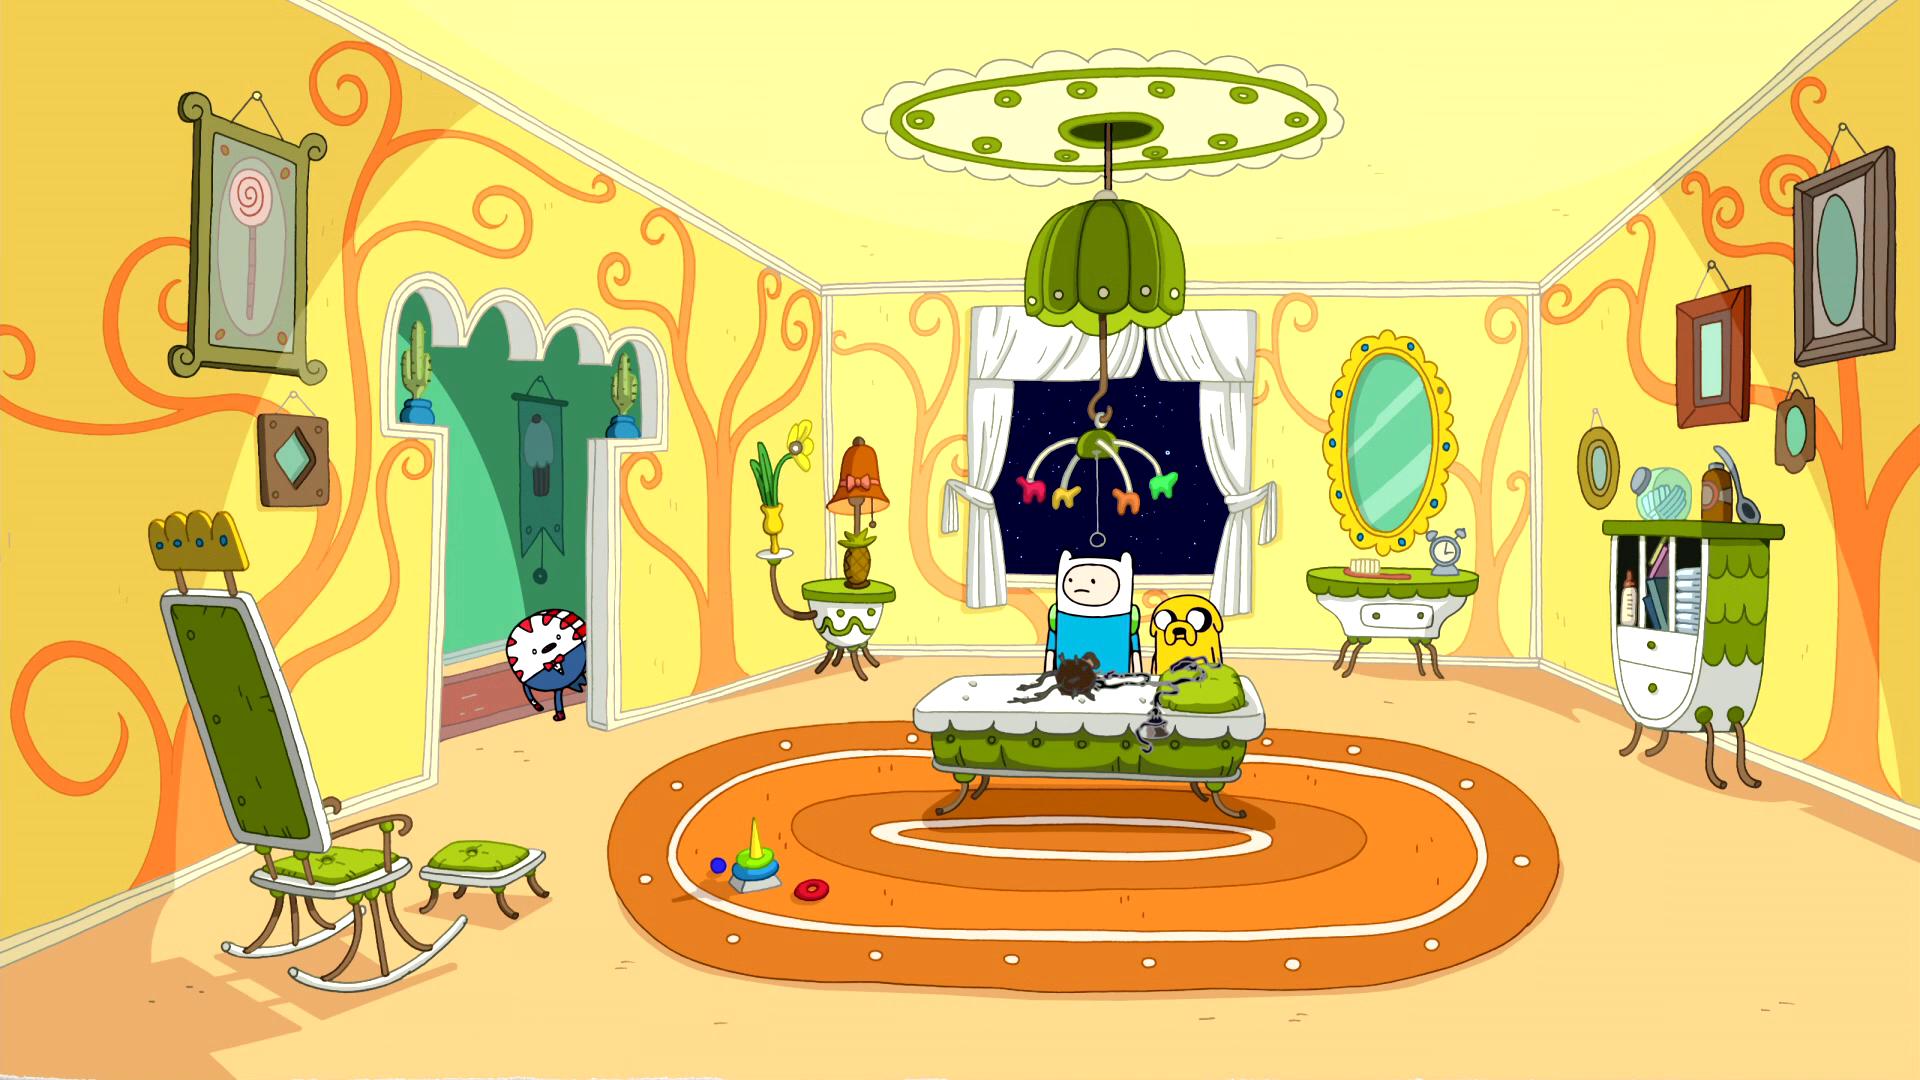 Princess Bubblegum\'s castle | Adventure Time Wiki | FANDOM powered ...